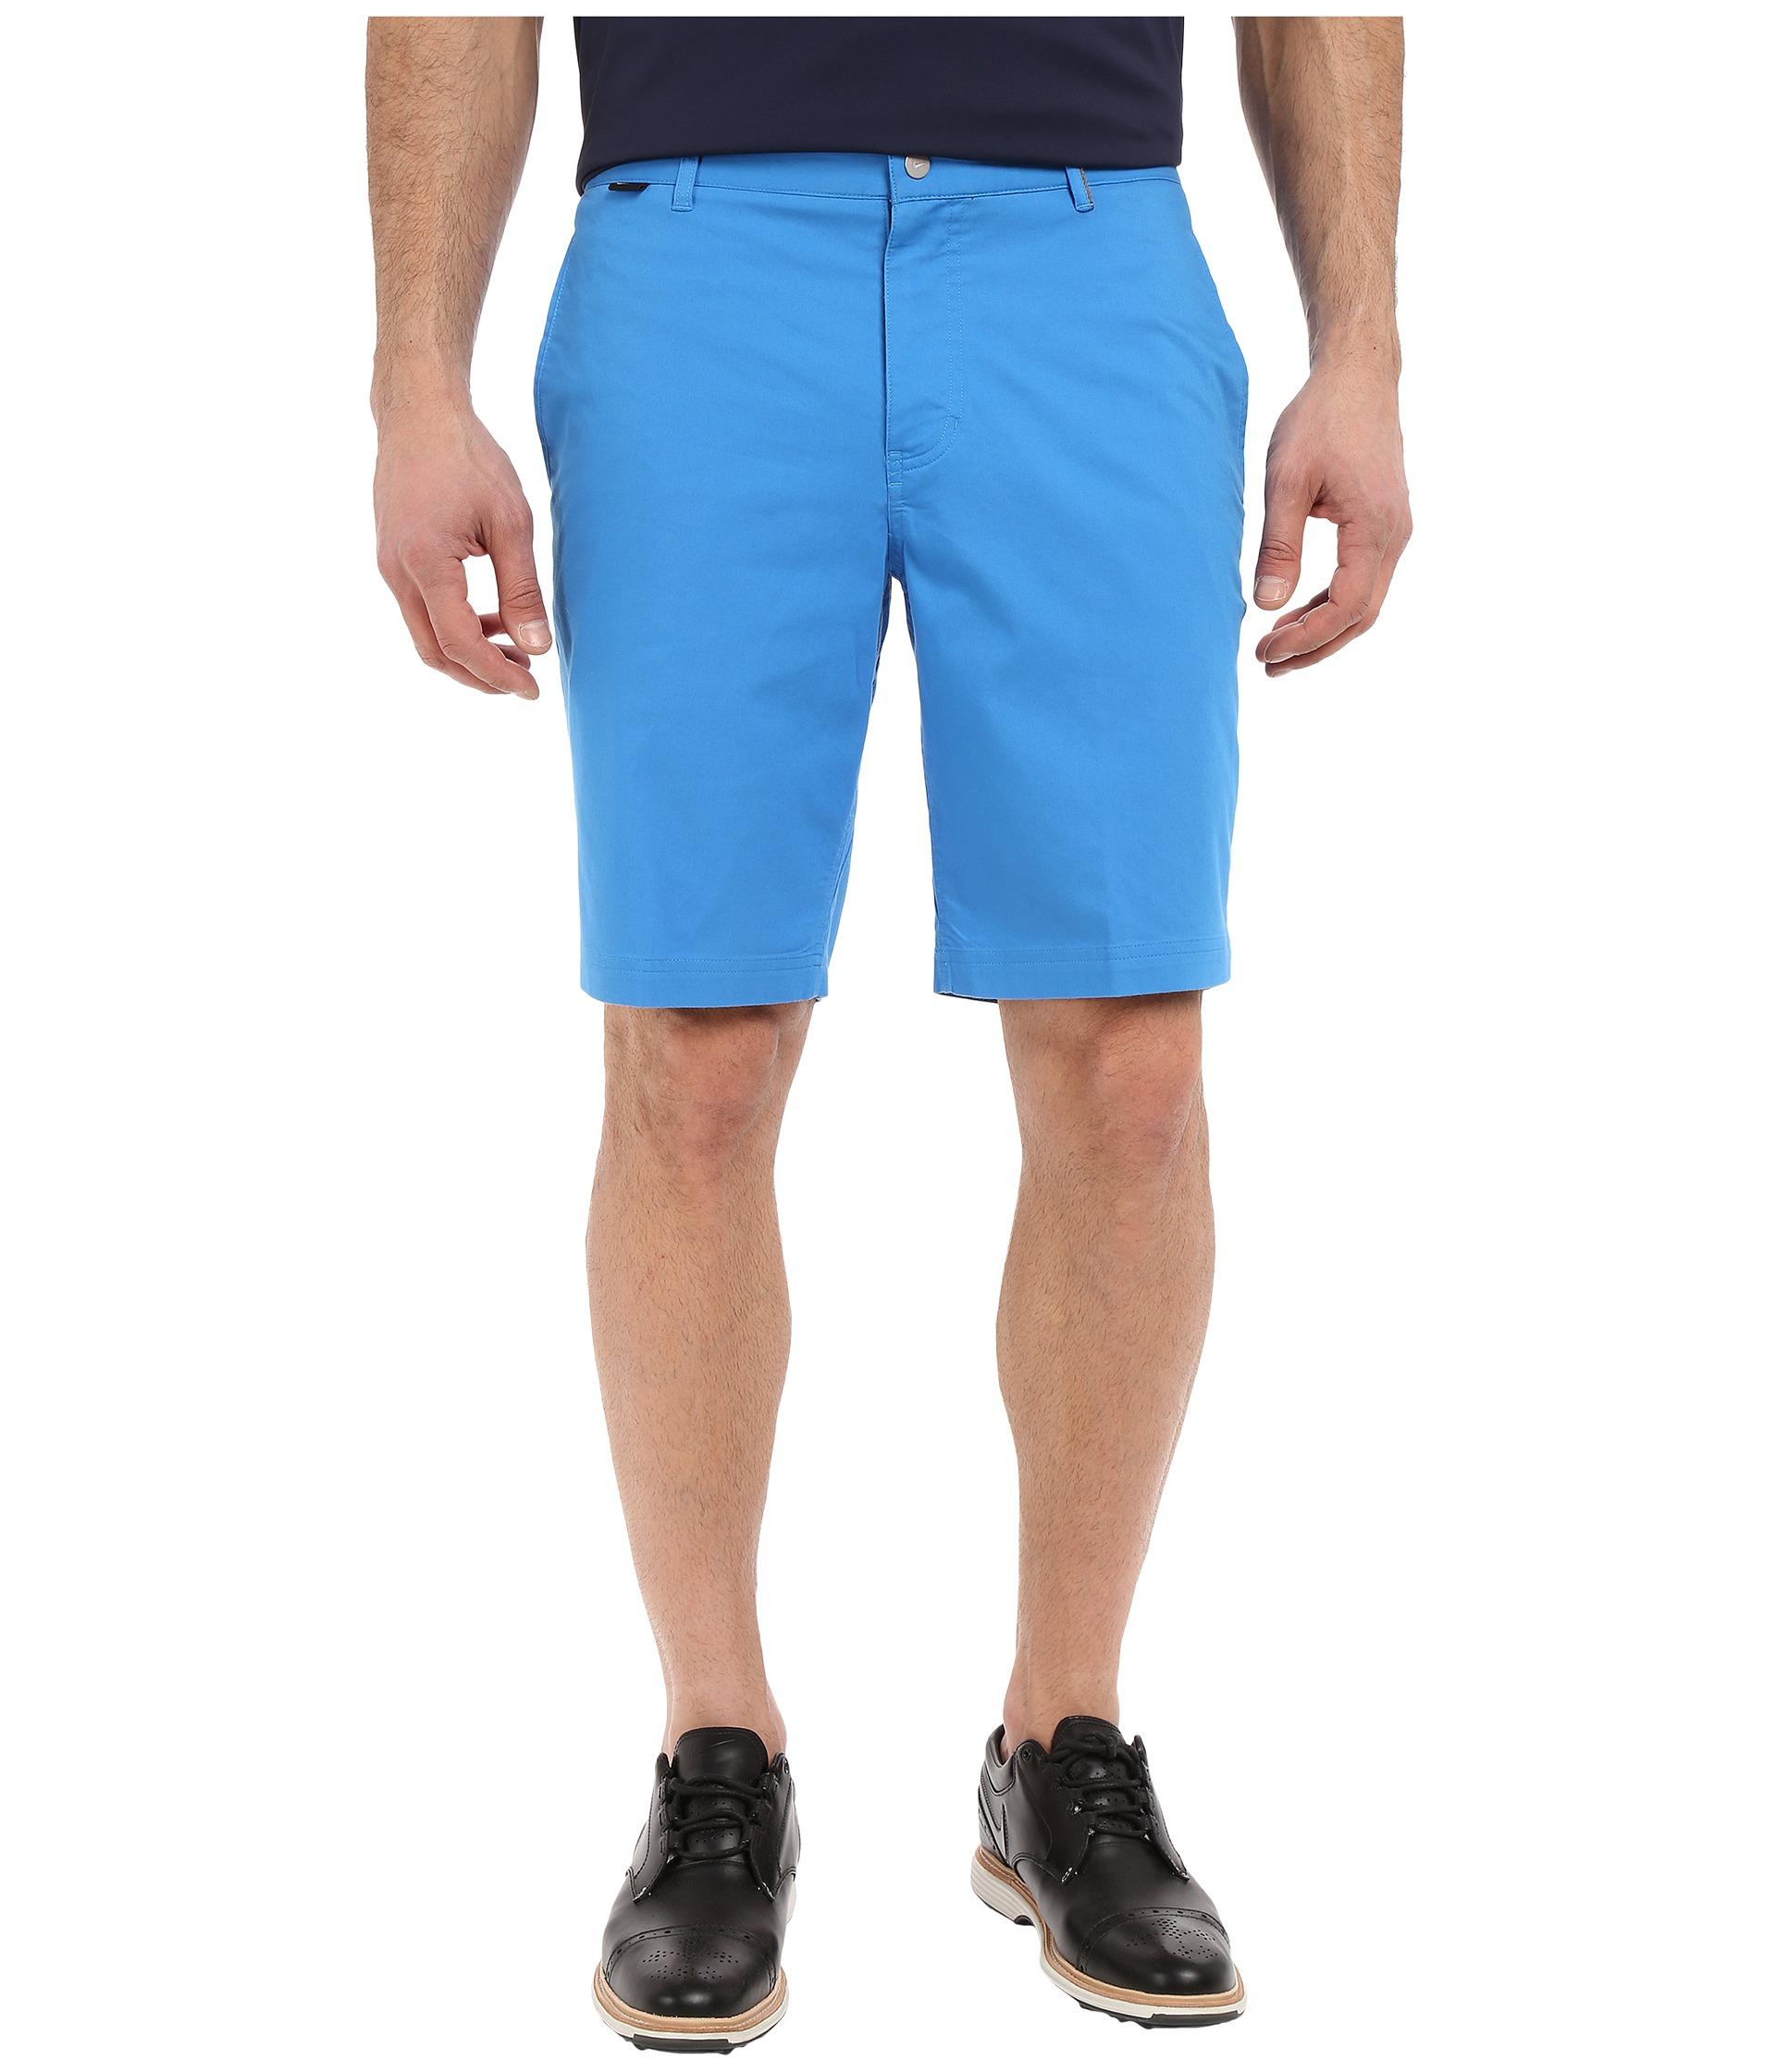 huge discount 6c6b5 98236 Nike Golf Modern Fit Washed Shorts